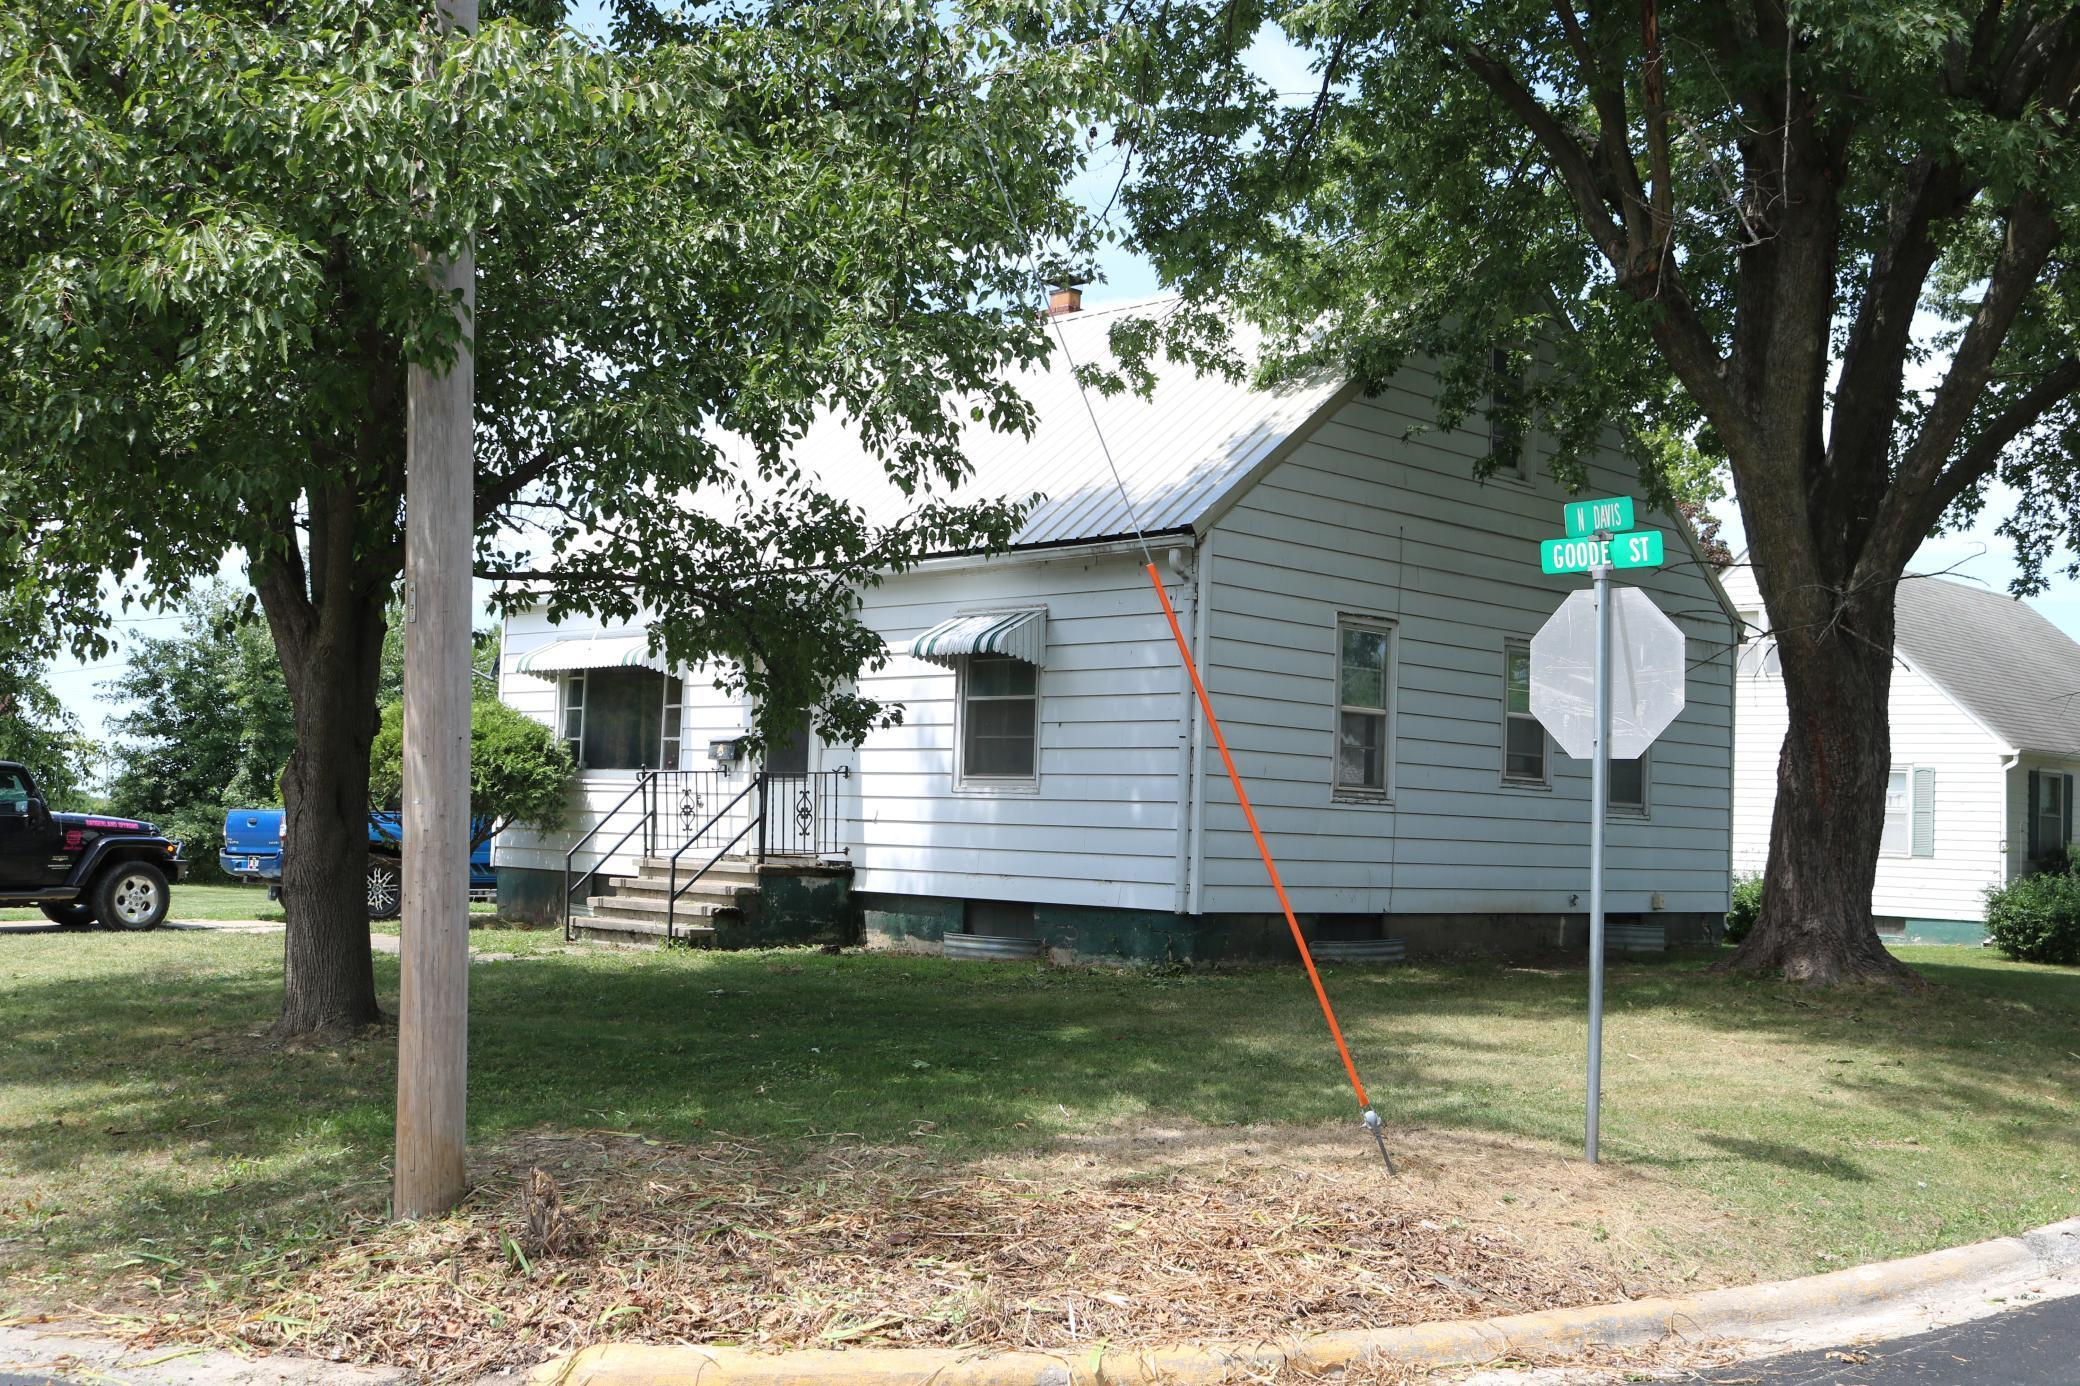 302 Goode Street